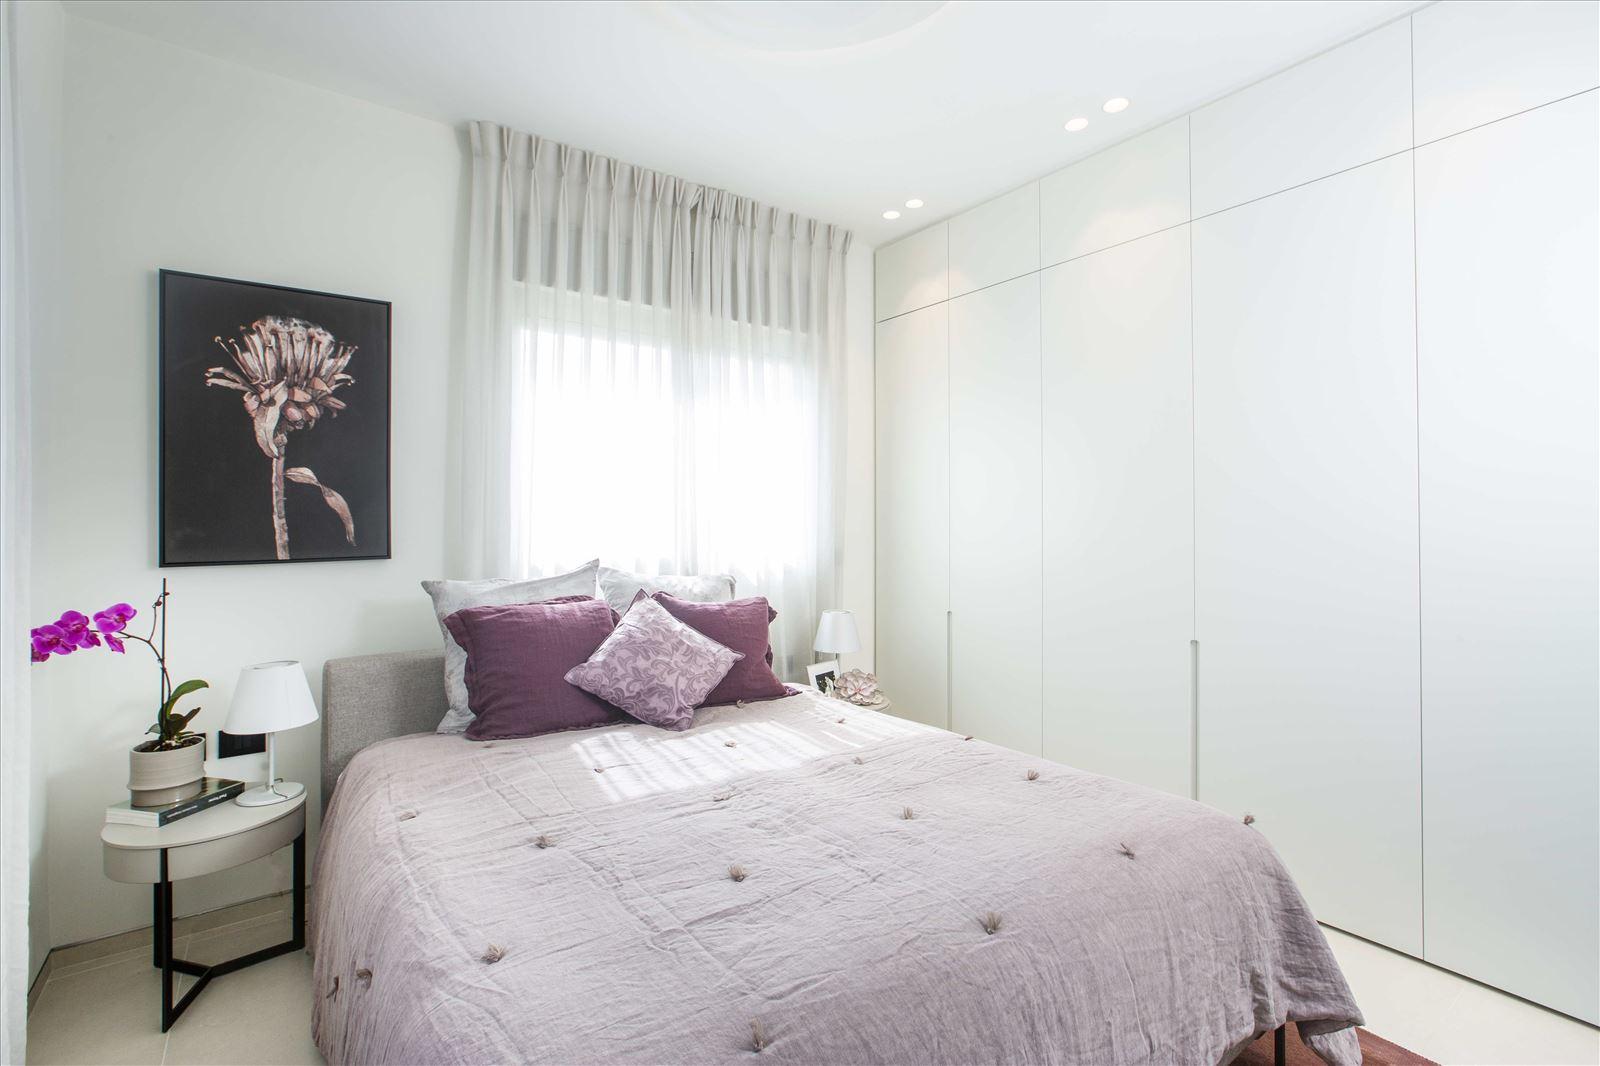 Tel Aviv apartment in Parisian aroma קמחי דורי - תאורה בחדר שינה